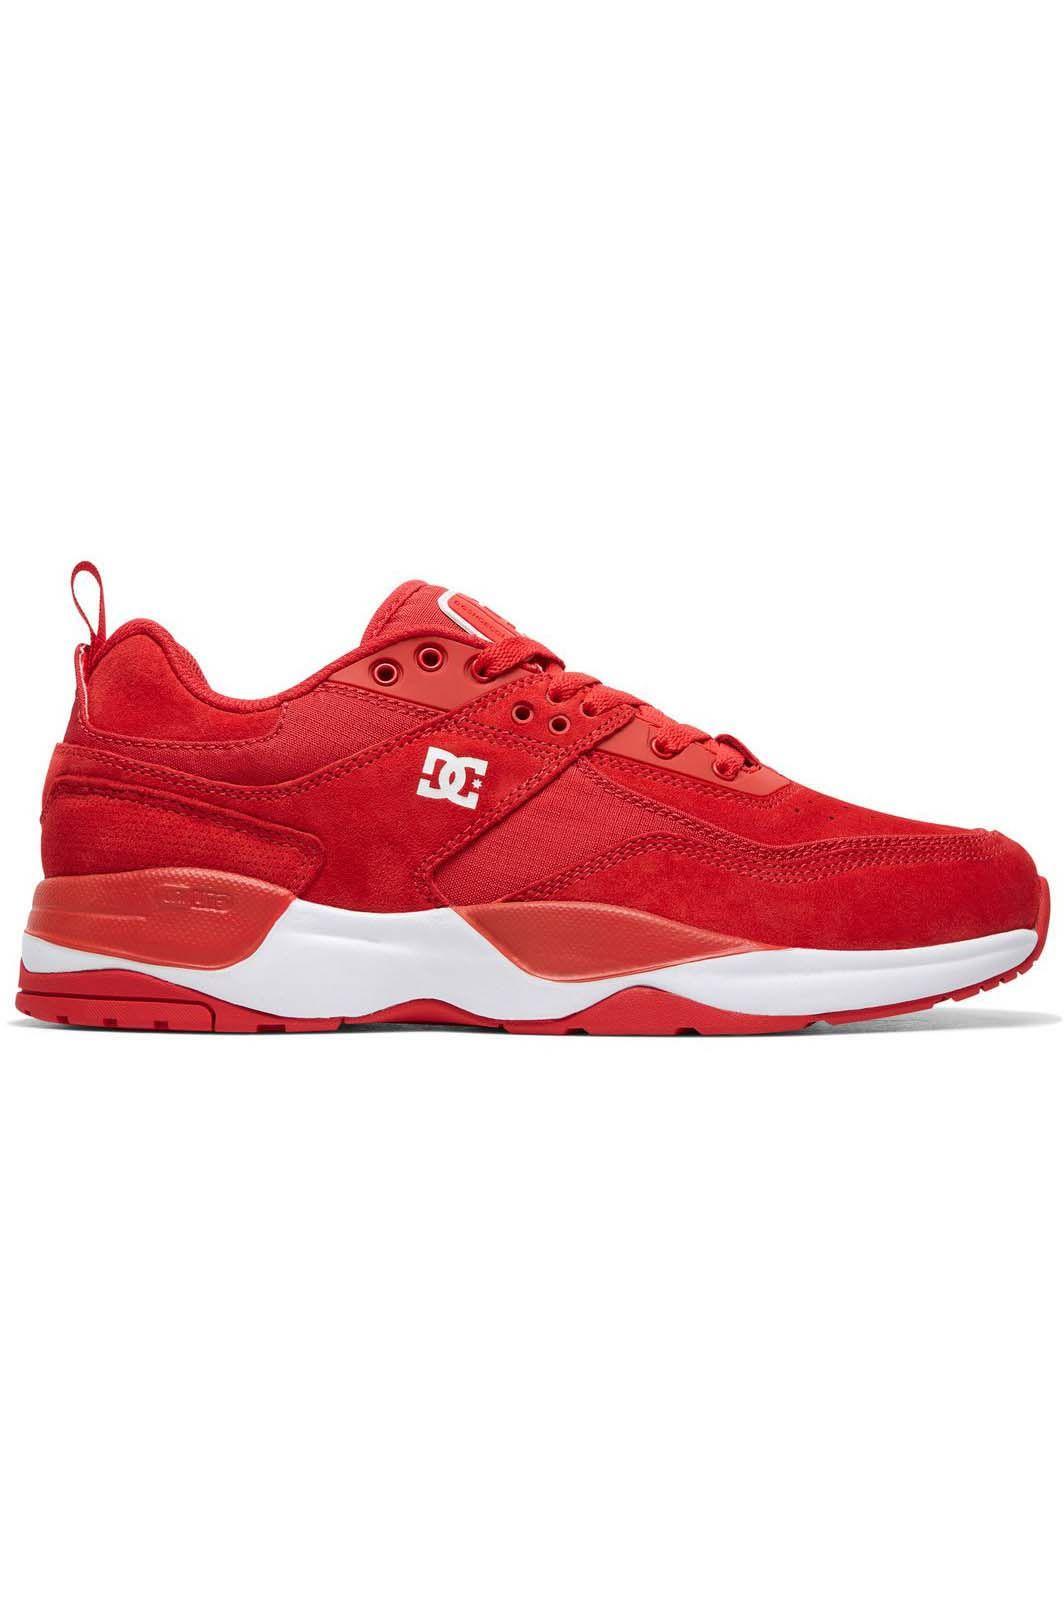 Tenis DC Shoes E.TRIBEKA Red